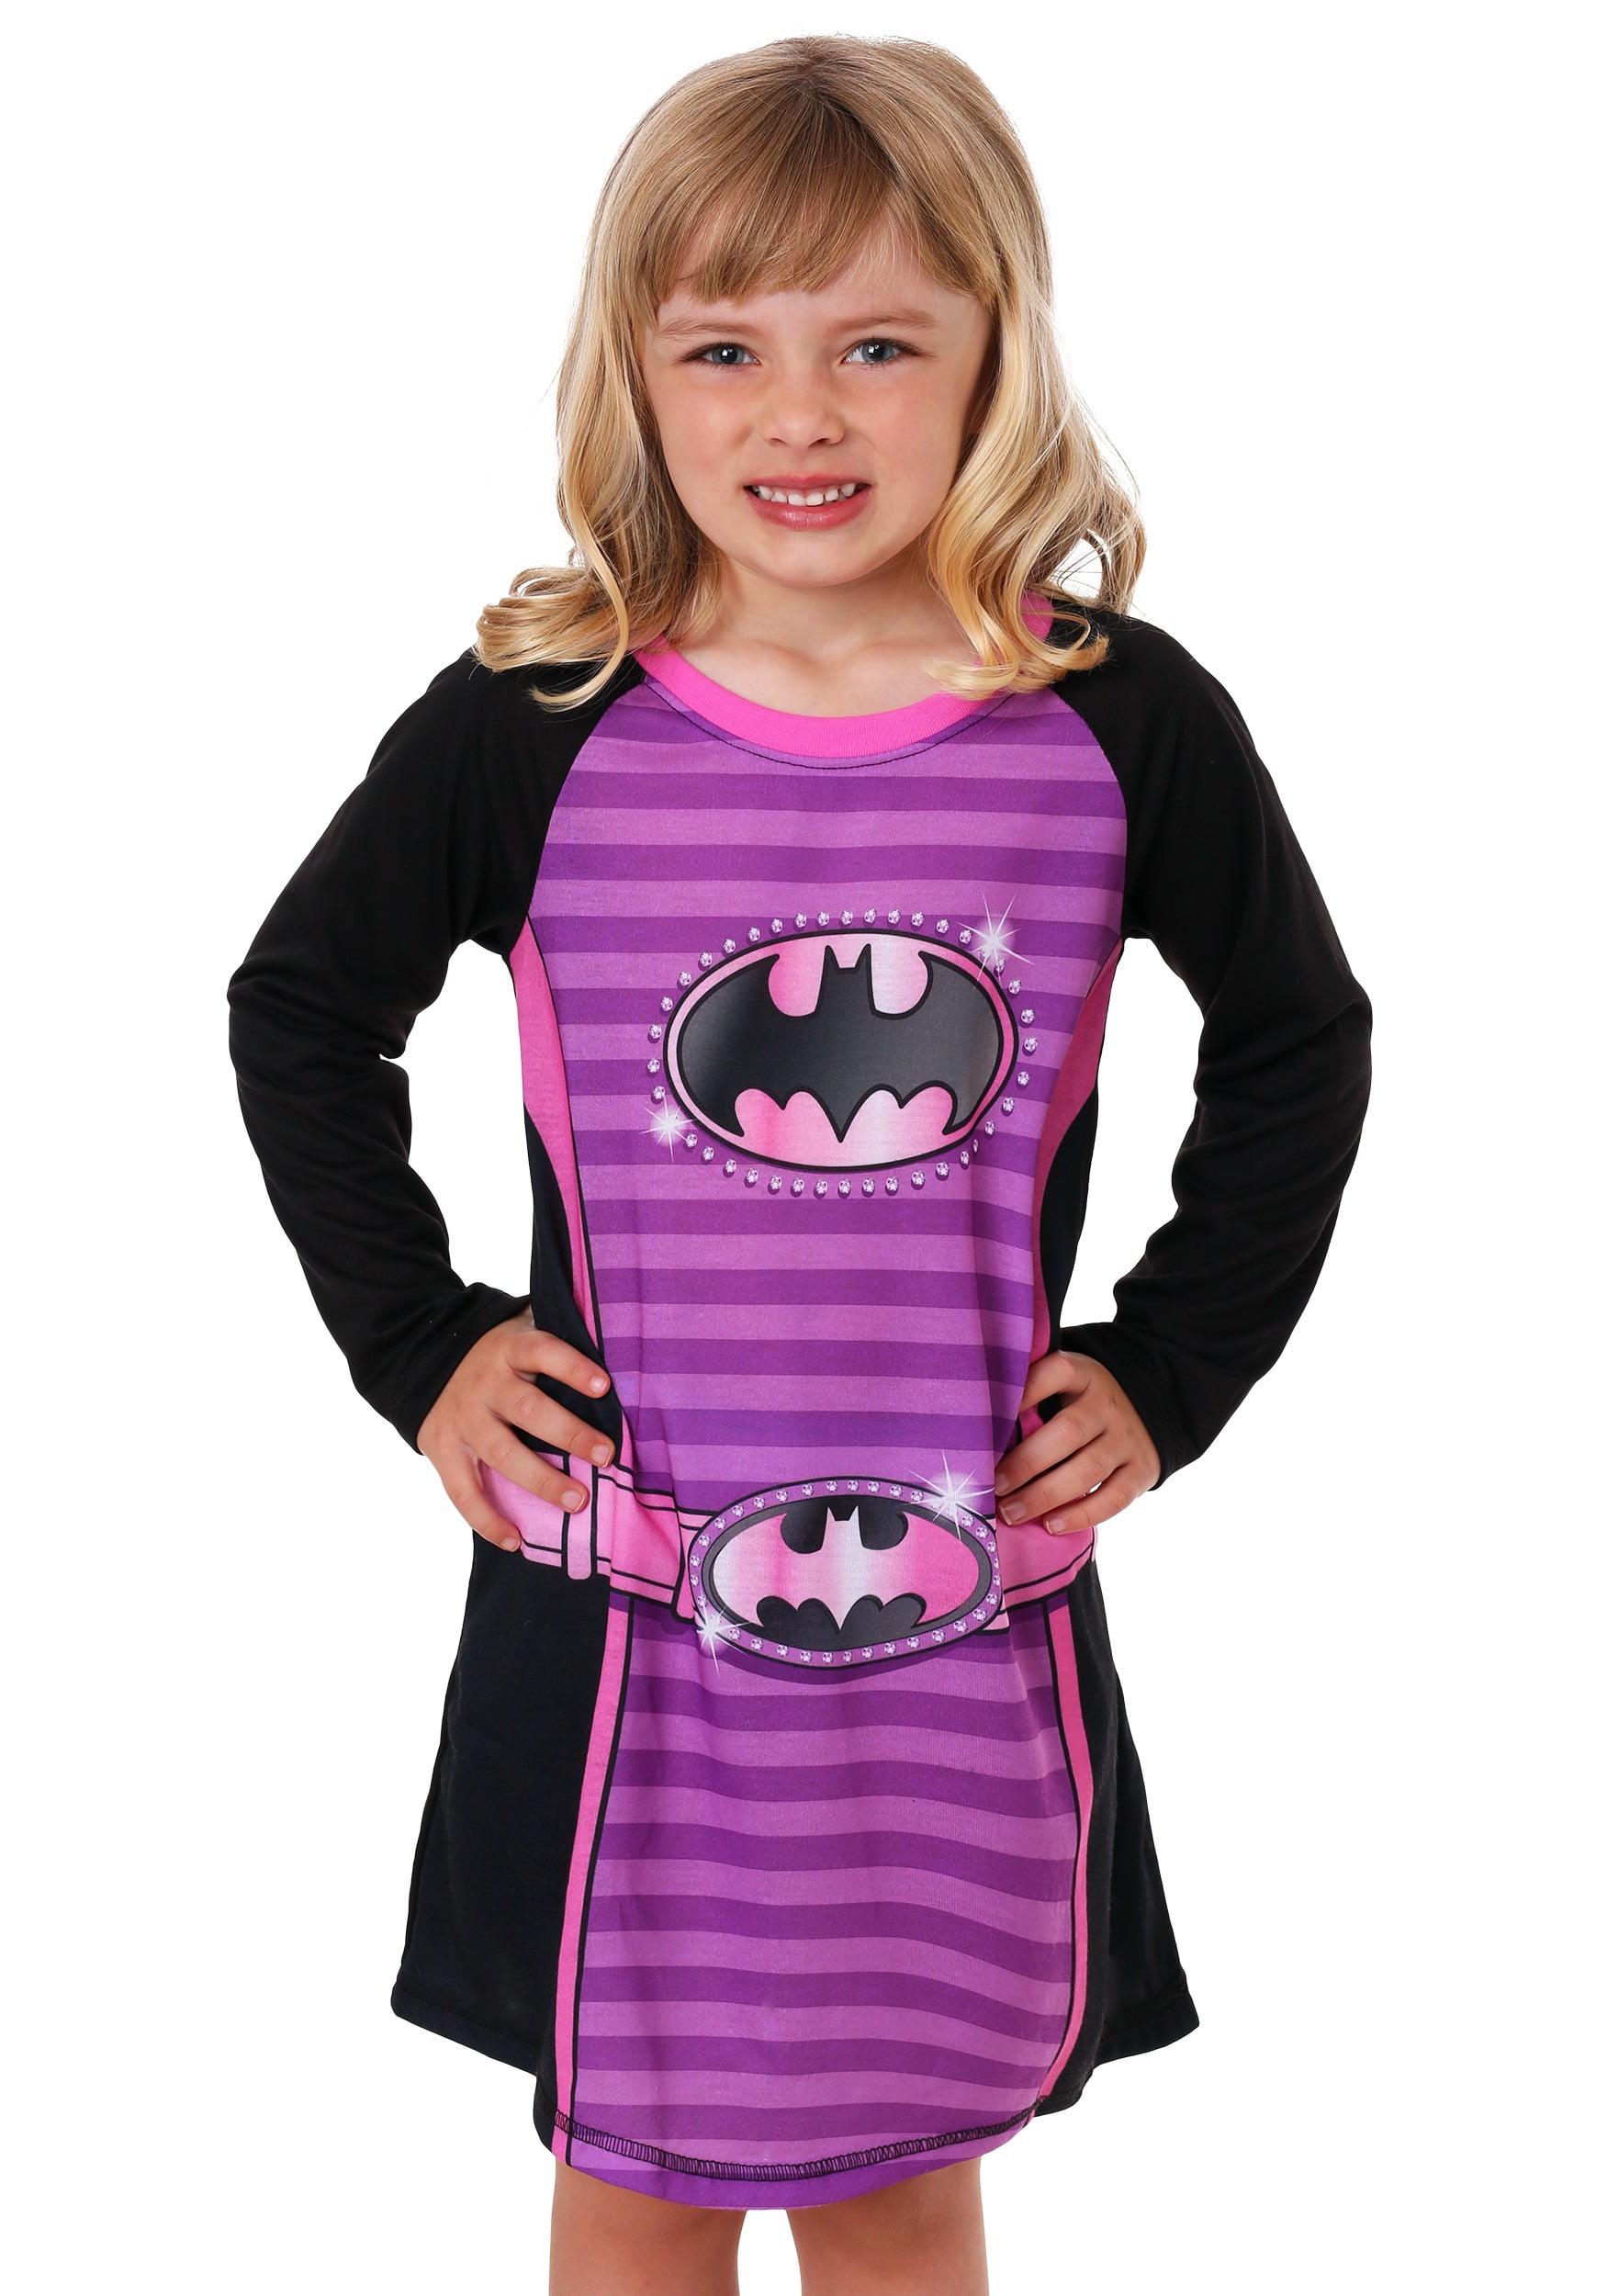 Batgirl Girl's Nightgown